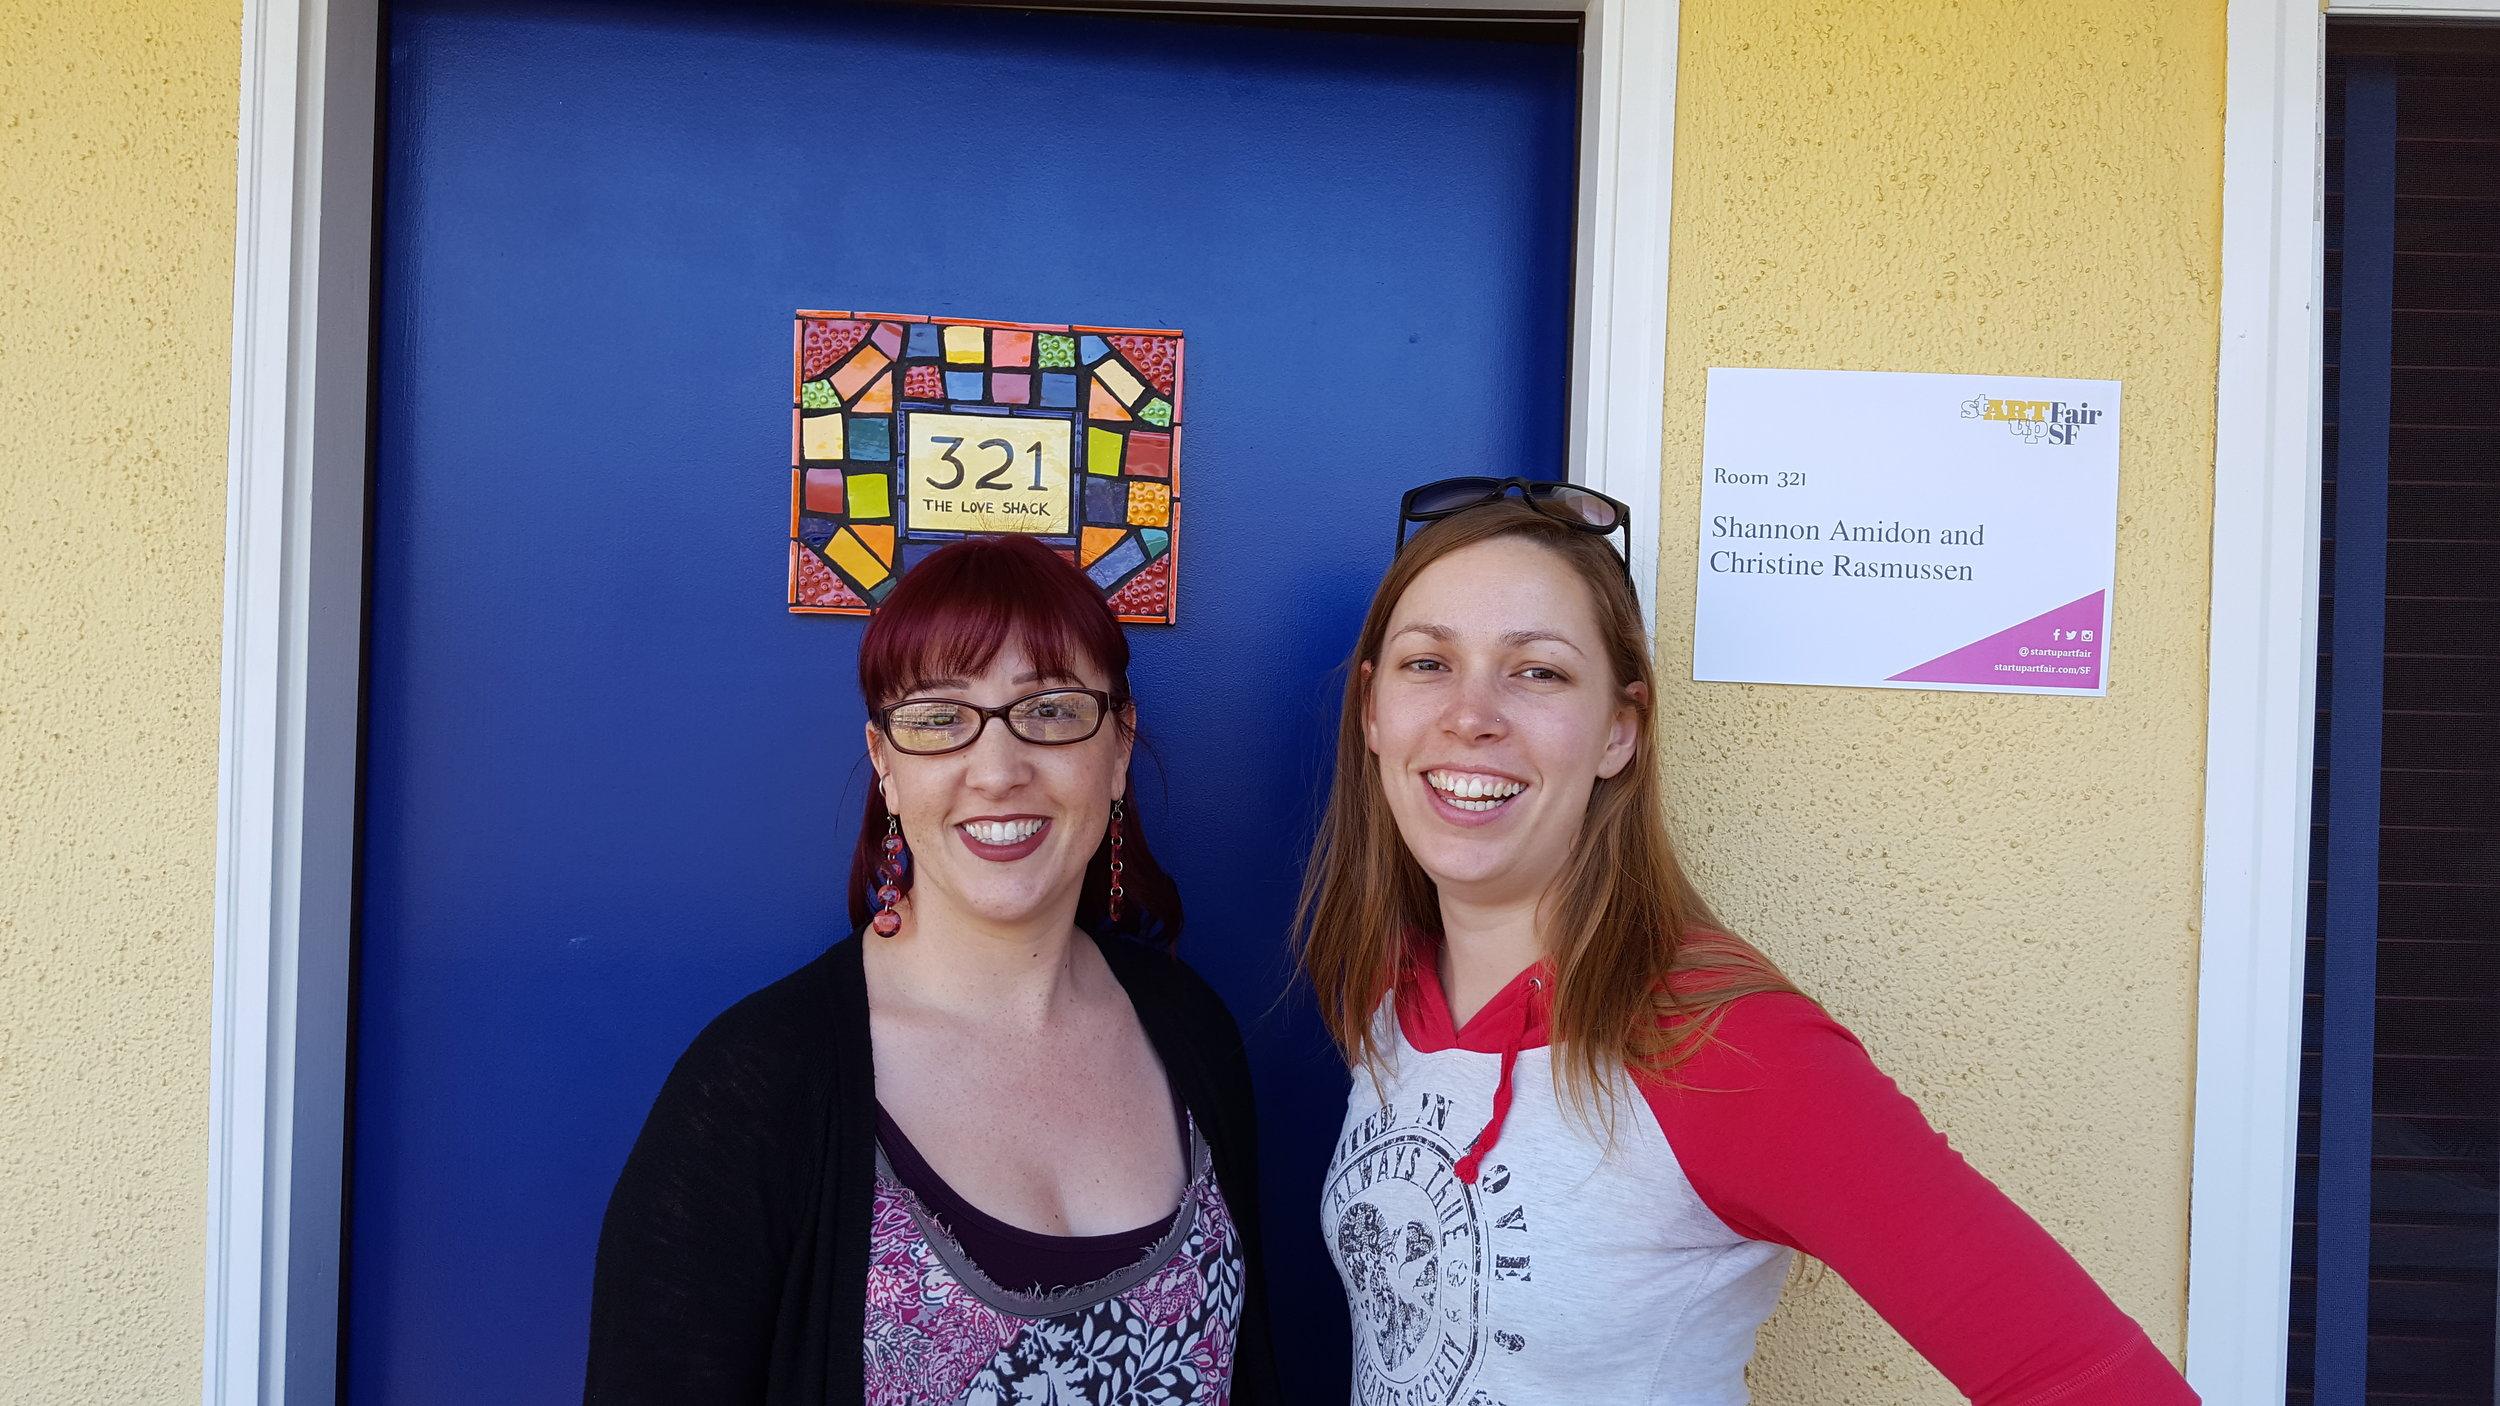 Shannon Amidon & Christine Rasmussen